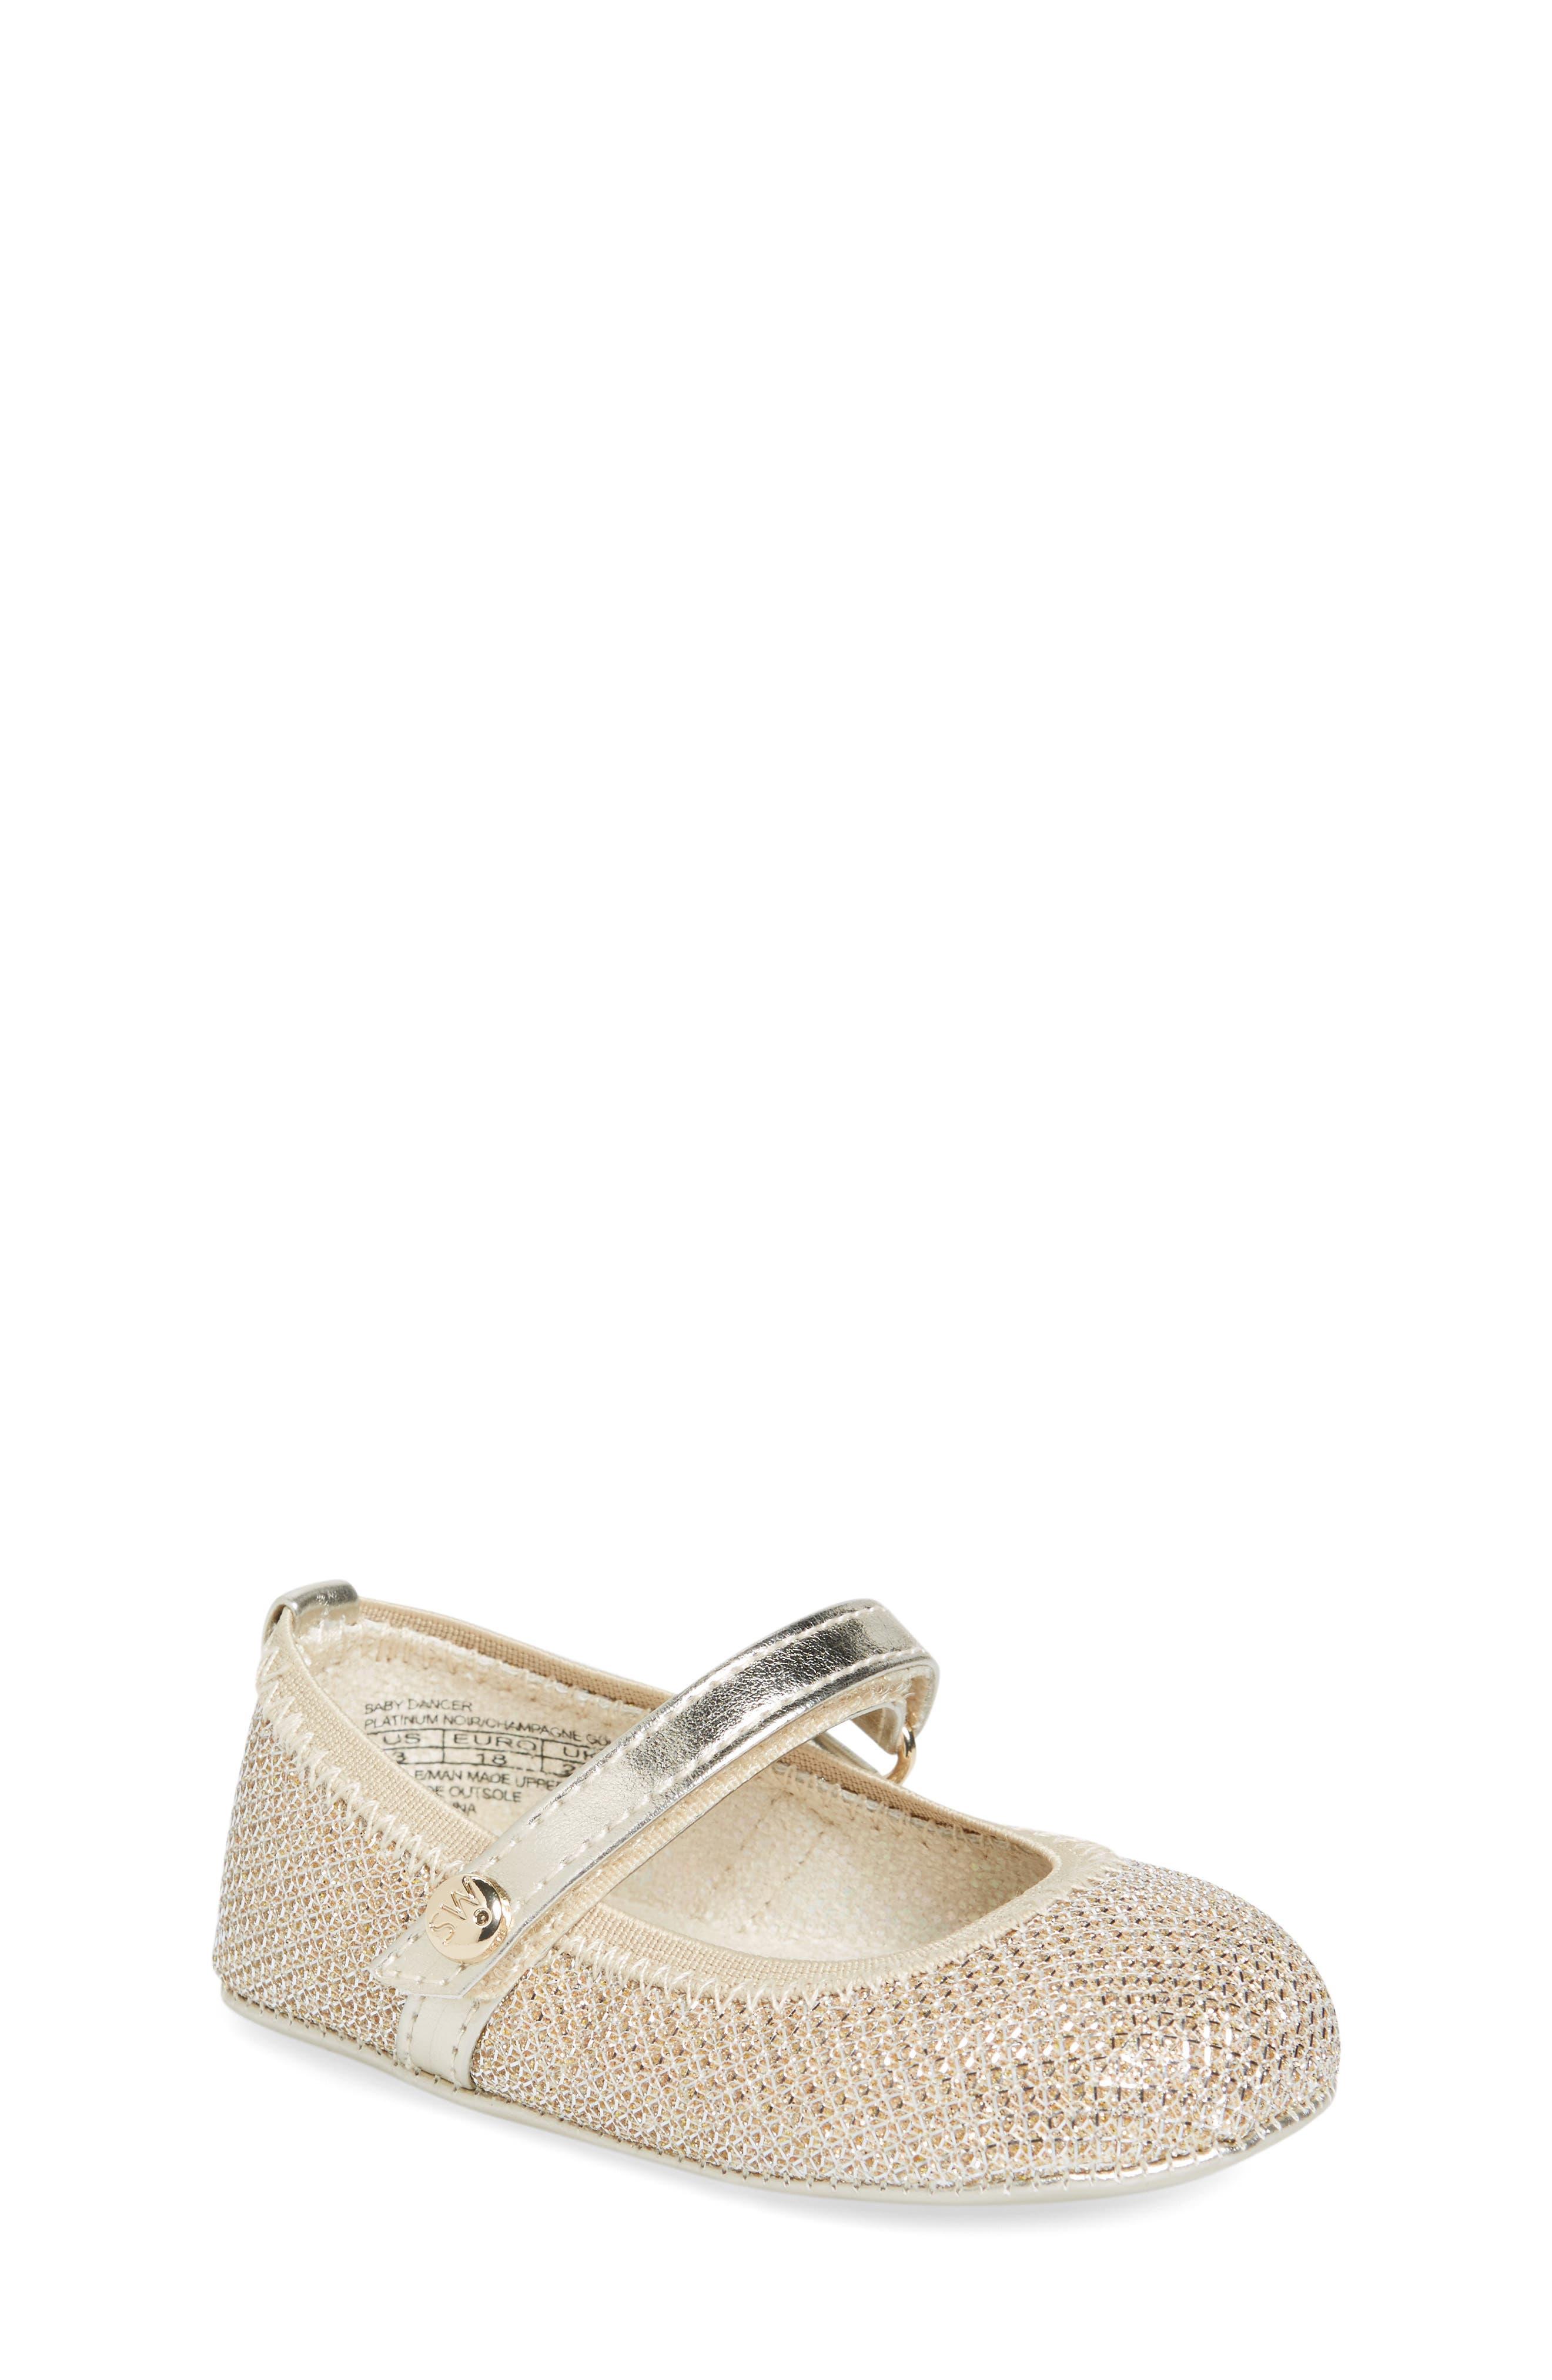 Baby Dancer Crib Shoe,                             Main thumbnail 1, color,                             Platinum Gold